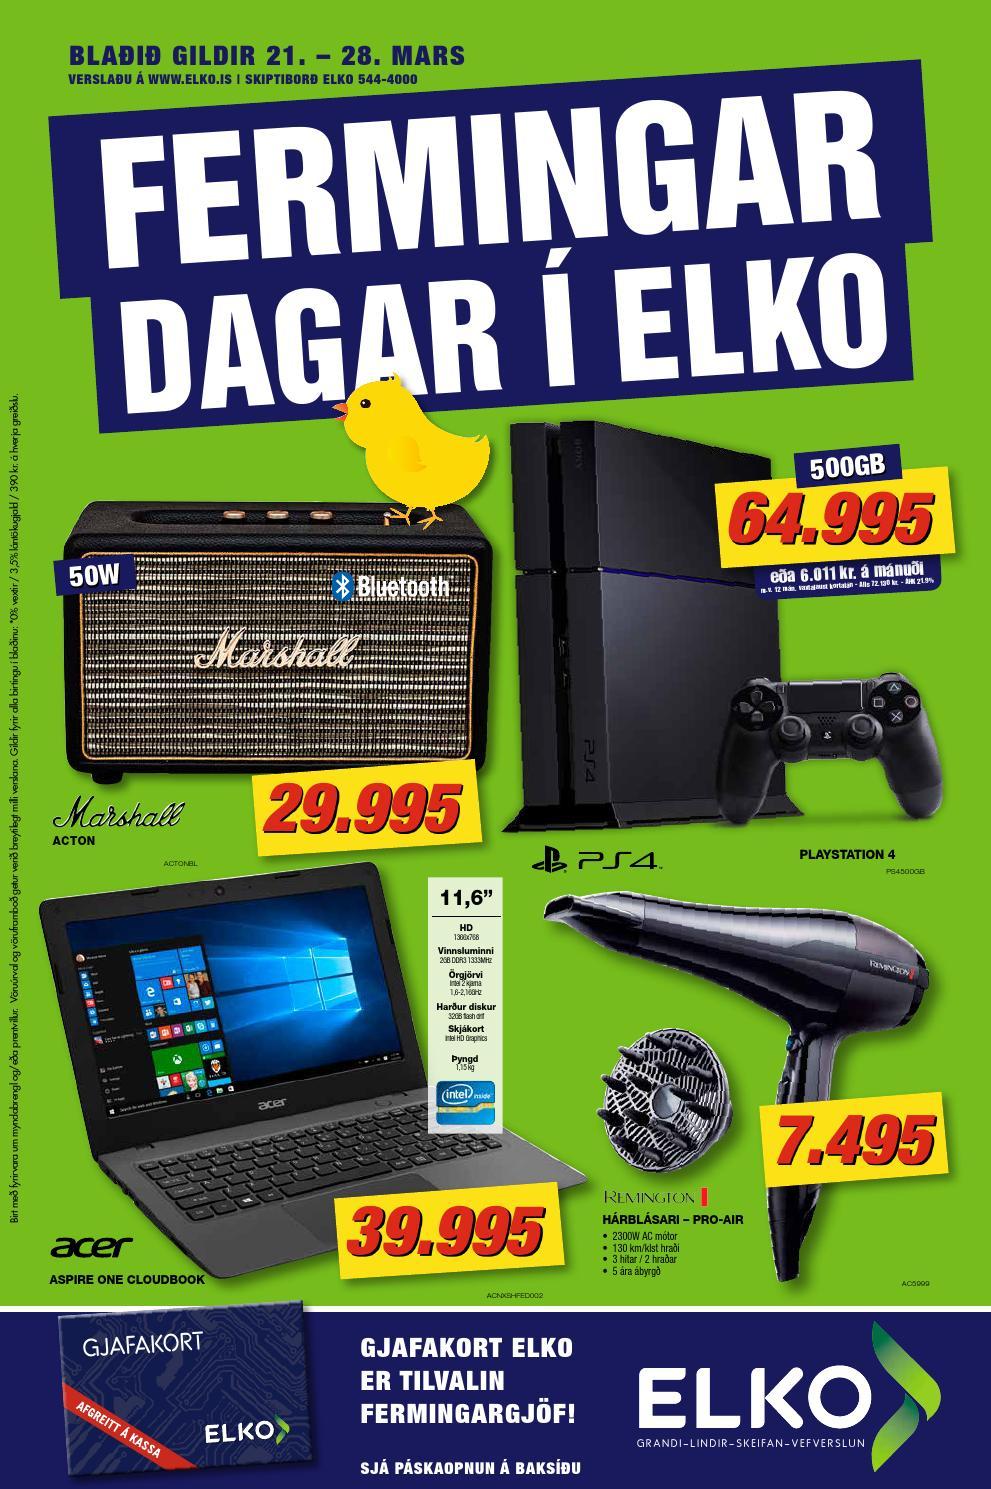 Elko bla i by elko issuu for Elko motor company elko nevada